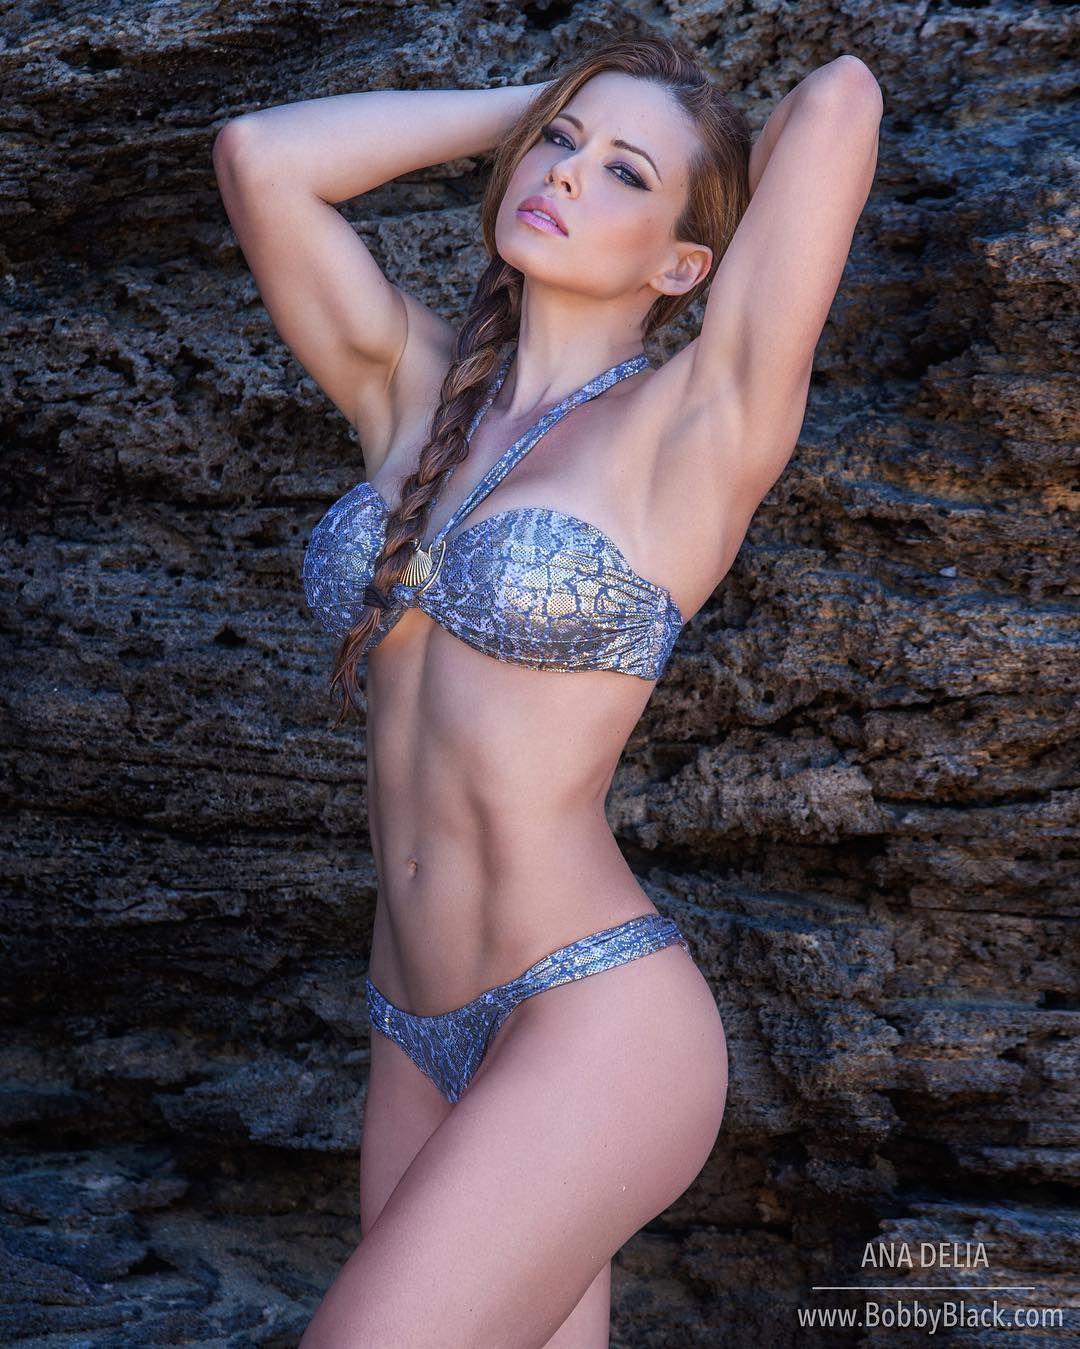 Ifbb Pro Athlete Model Anadelia Anadeliafitness Gmail Com